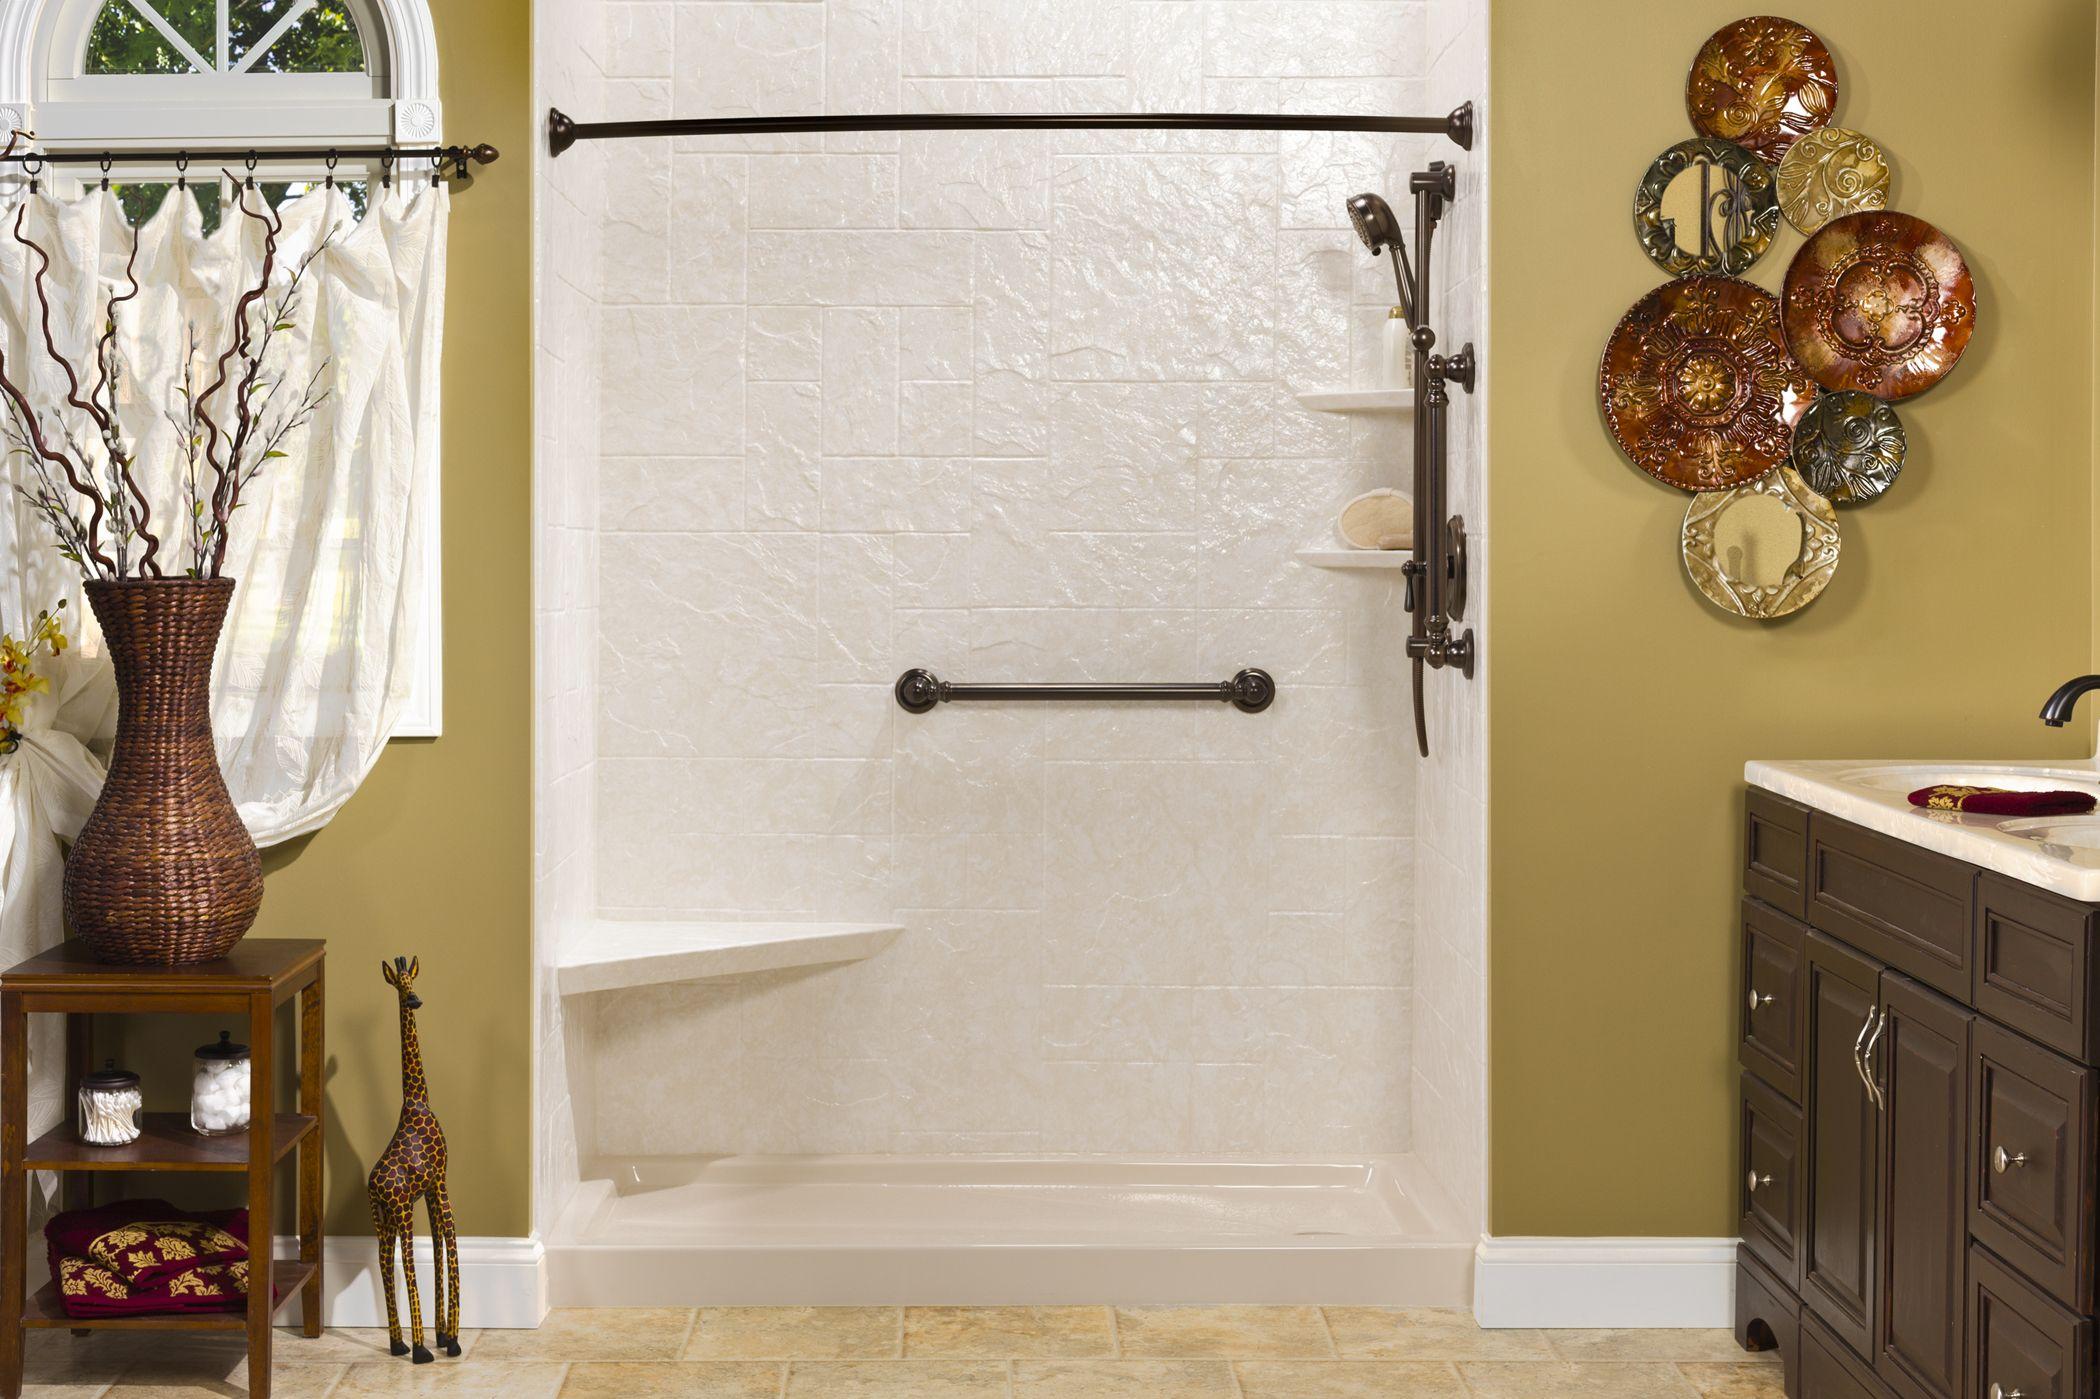 Rainbow Bath Shower Convert Your Tub To A Walk In